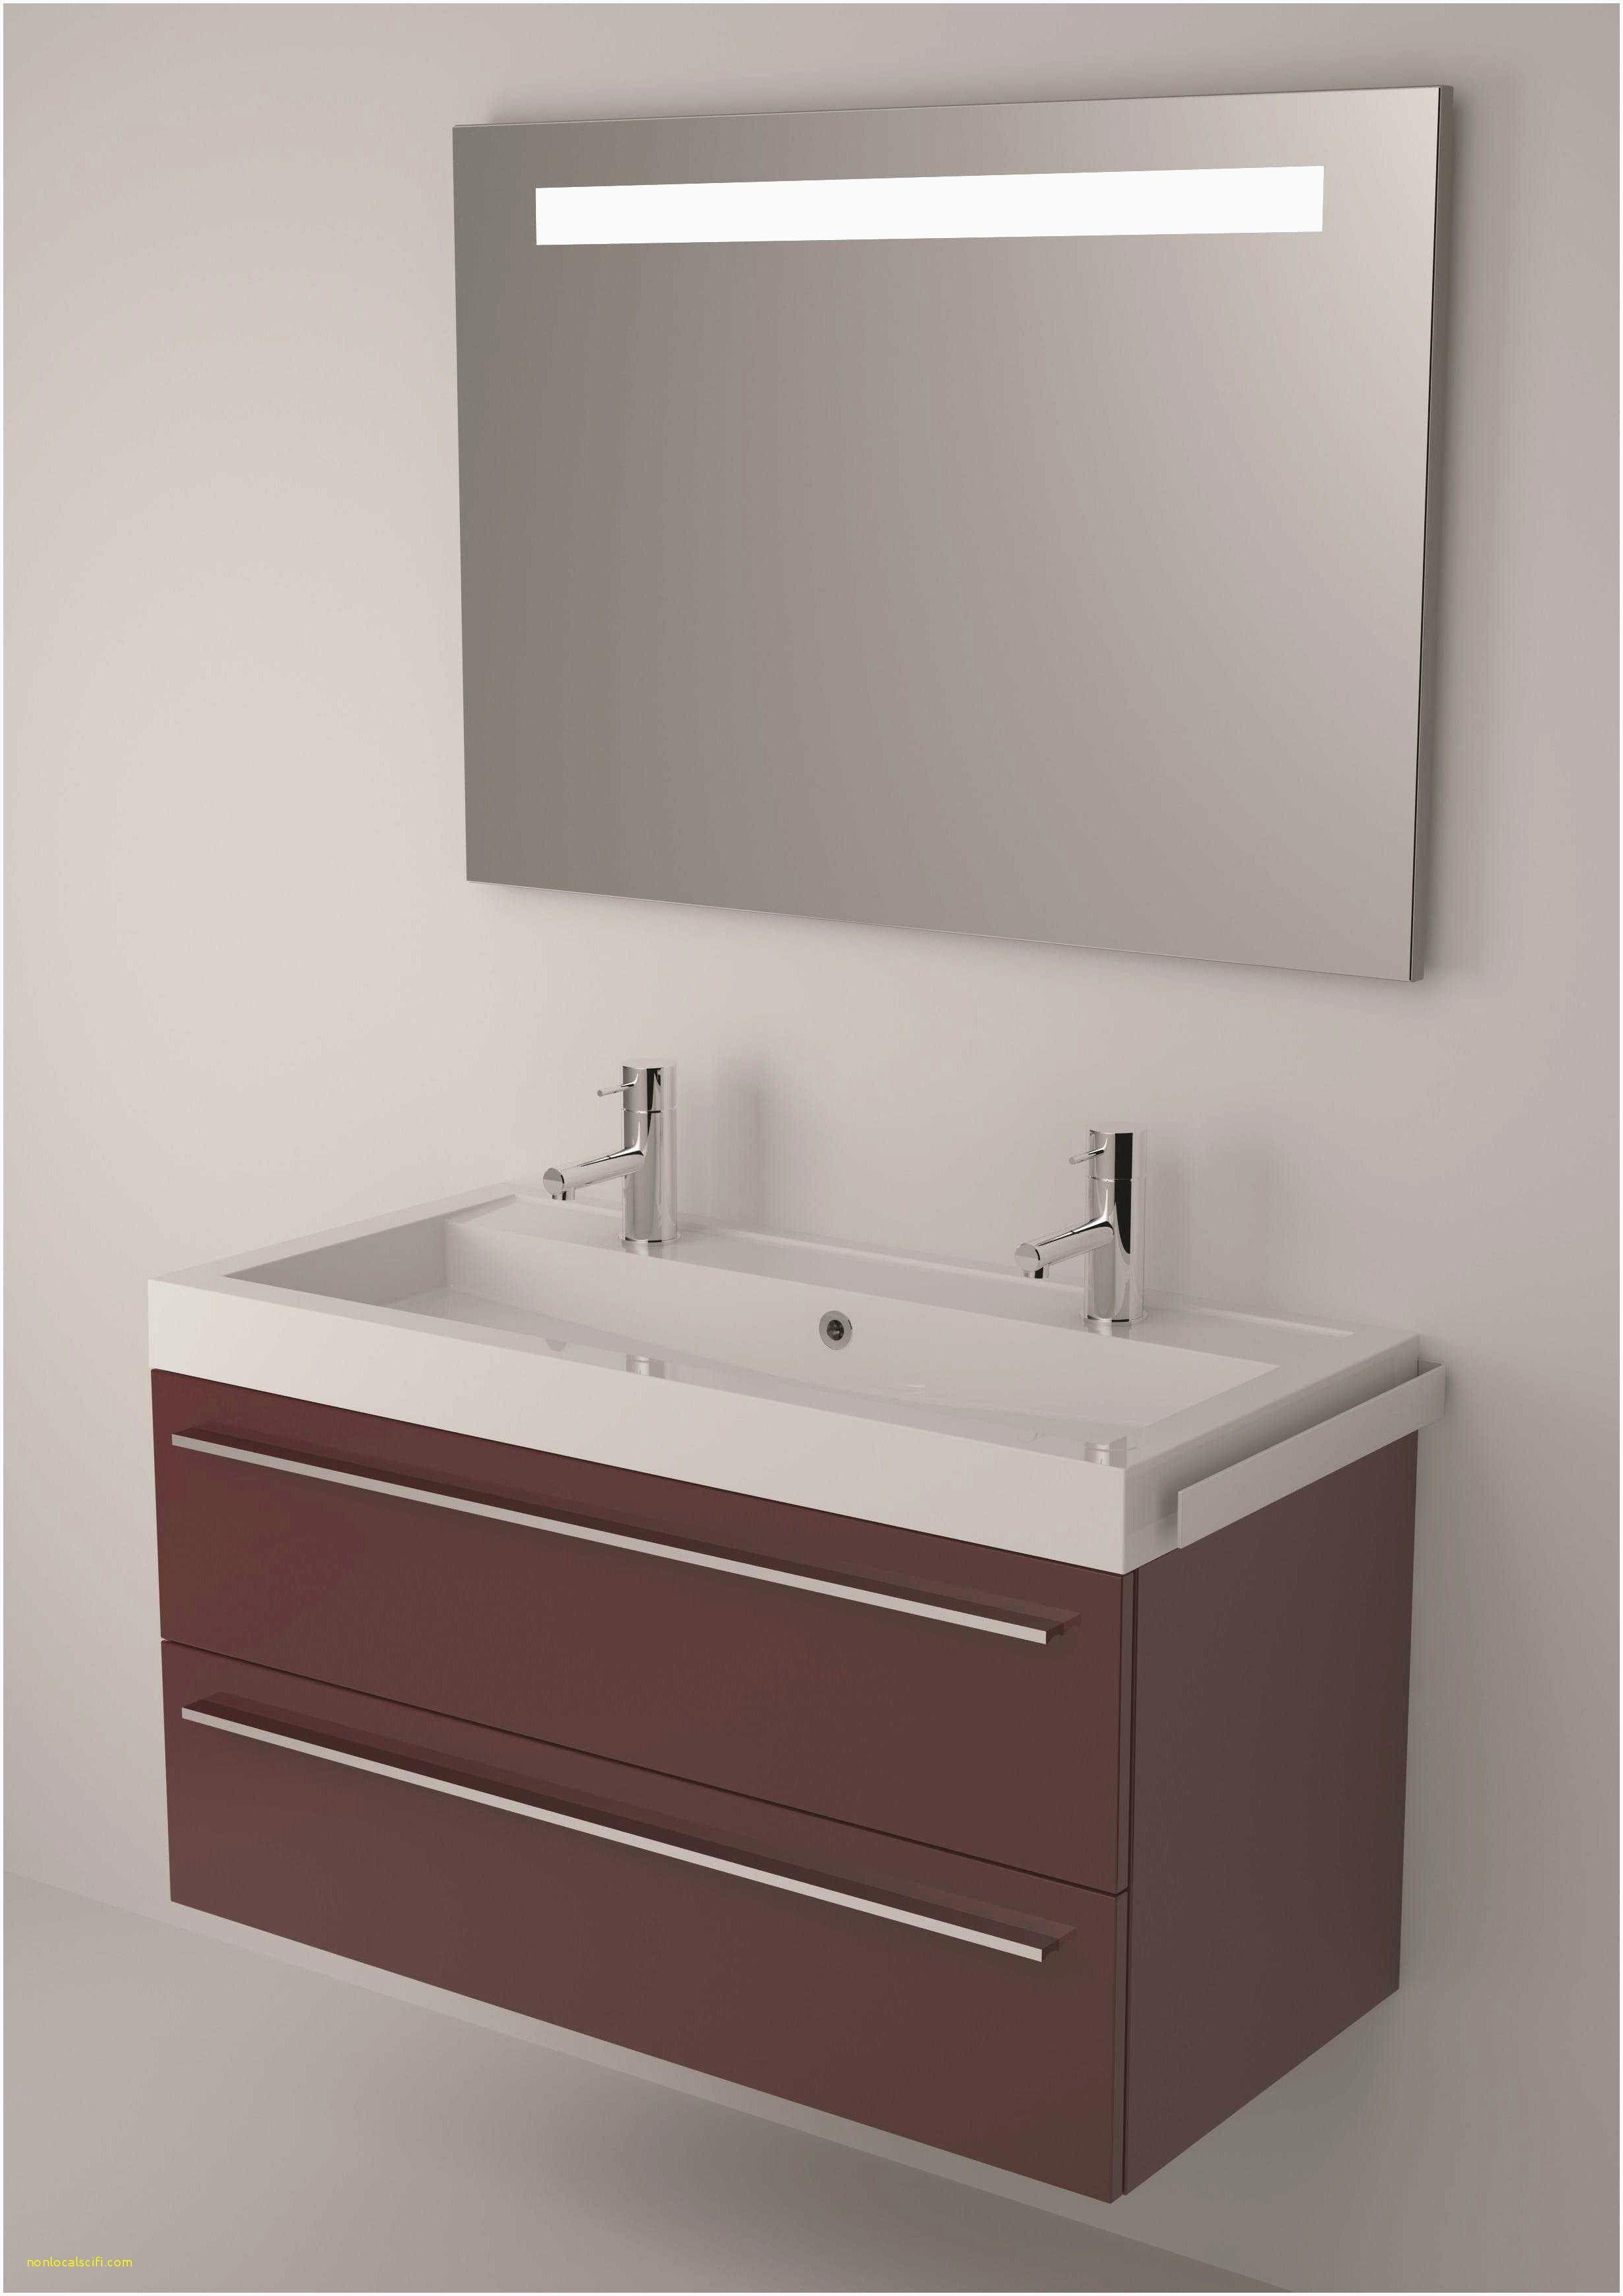 Best Of Meuble Salle De Bain Profondeur 35 Cheap Bathrooms Ikea Bathroom Sinks Bathroom Ladder